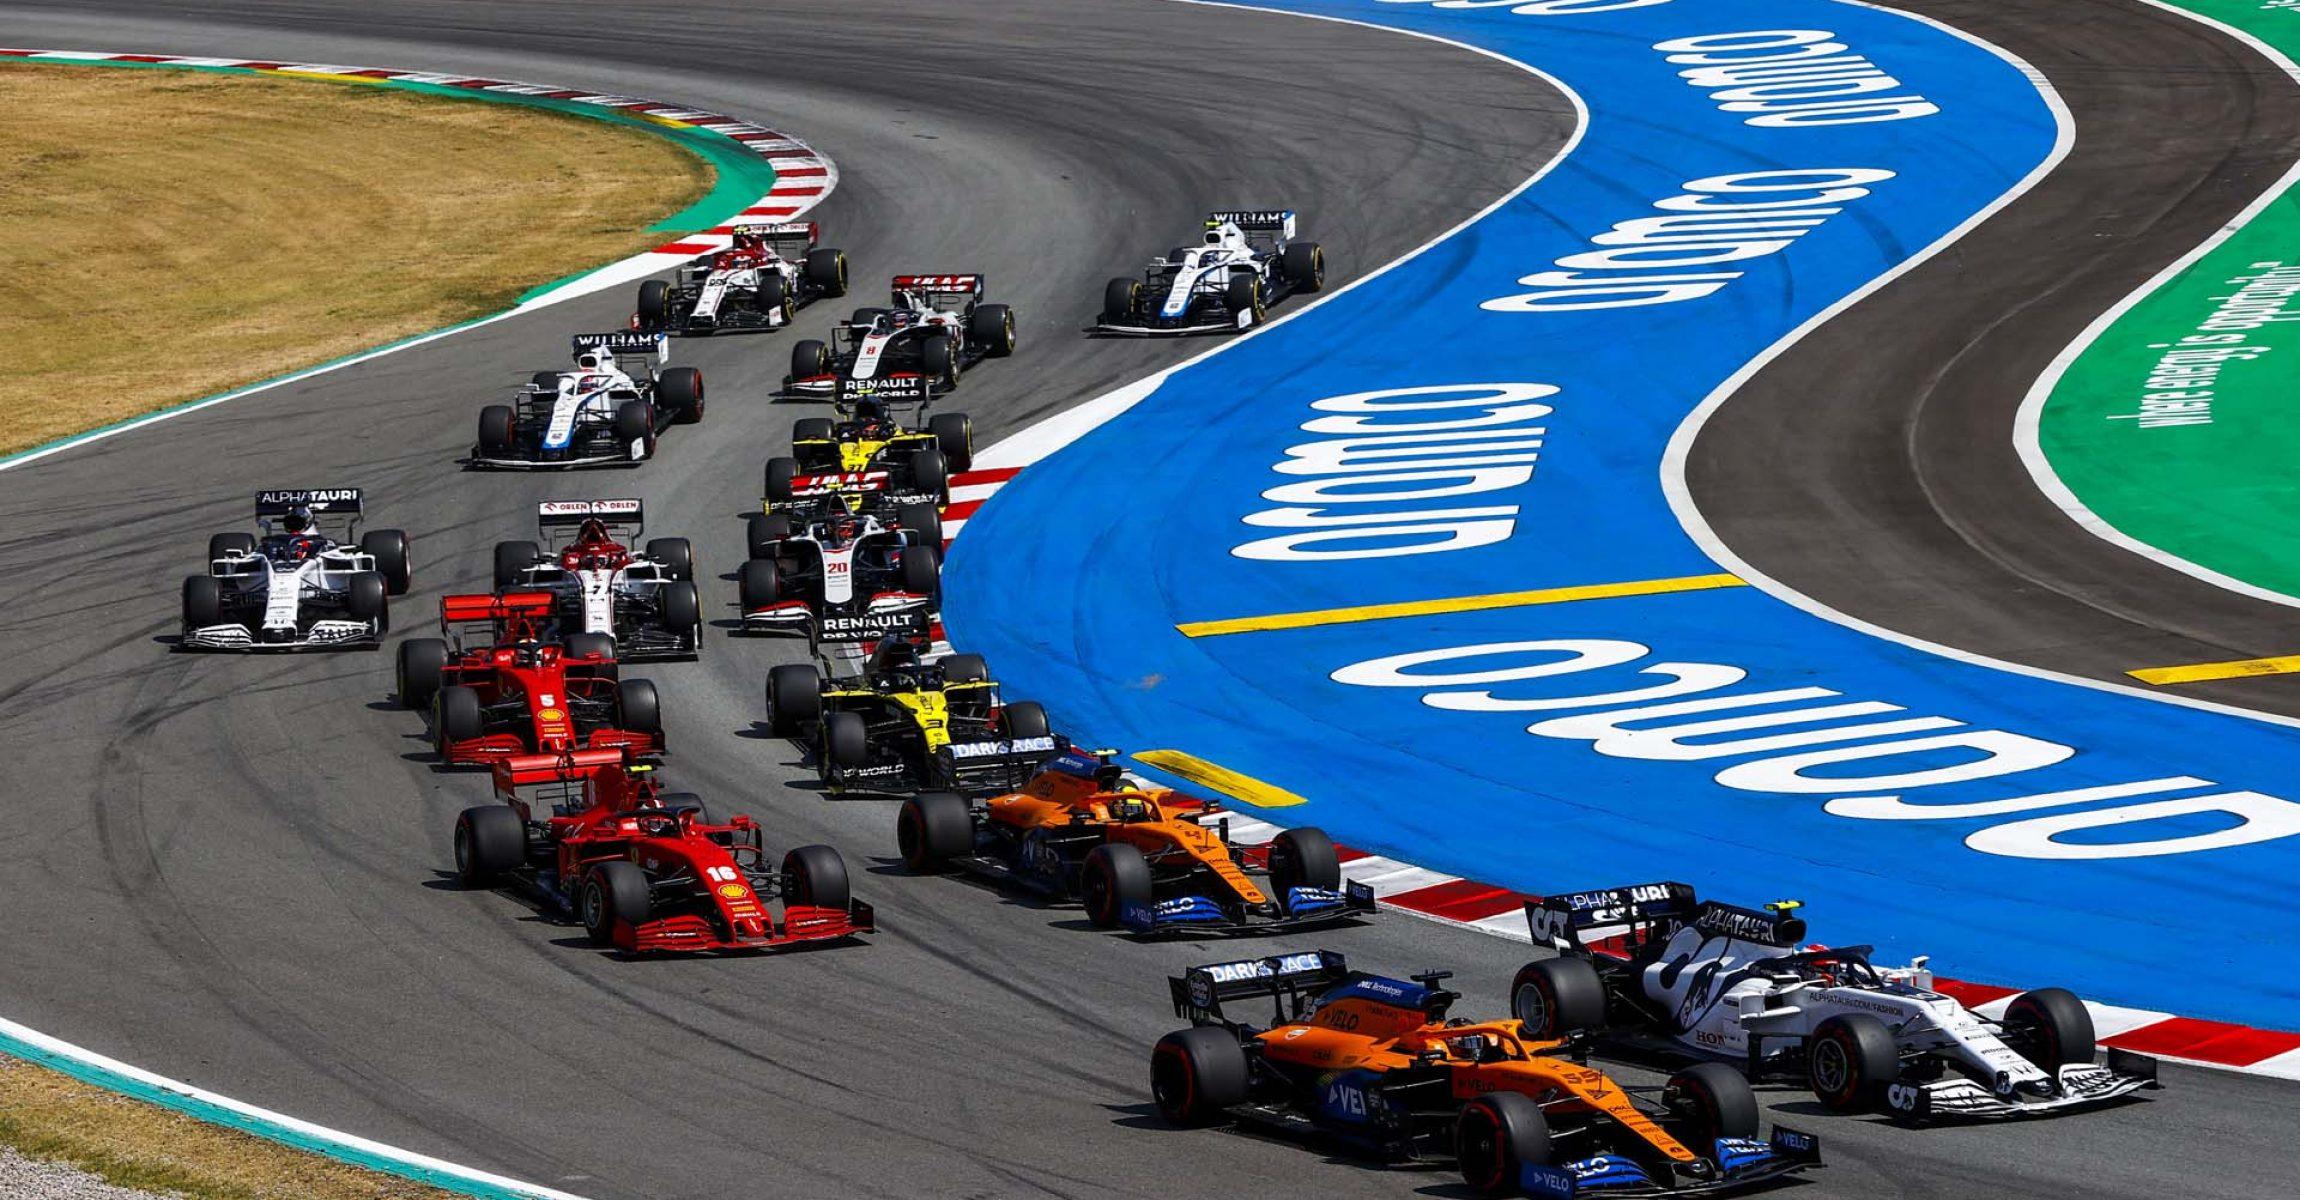 Carlos Sainz, McLaren MCL35, leads Pierre Gasly, AlphaTauri AT01, Lando Norris, McLaren MCL35, Charles Leclerc, Ferrari SF1000, Daniel Ricciardo, Renault R.S.20, Sebastian Vettel, Ferrari SF1000, and the remainder of the field at the start